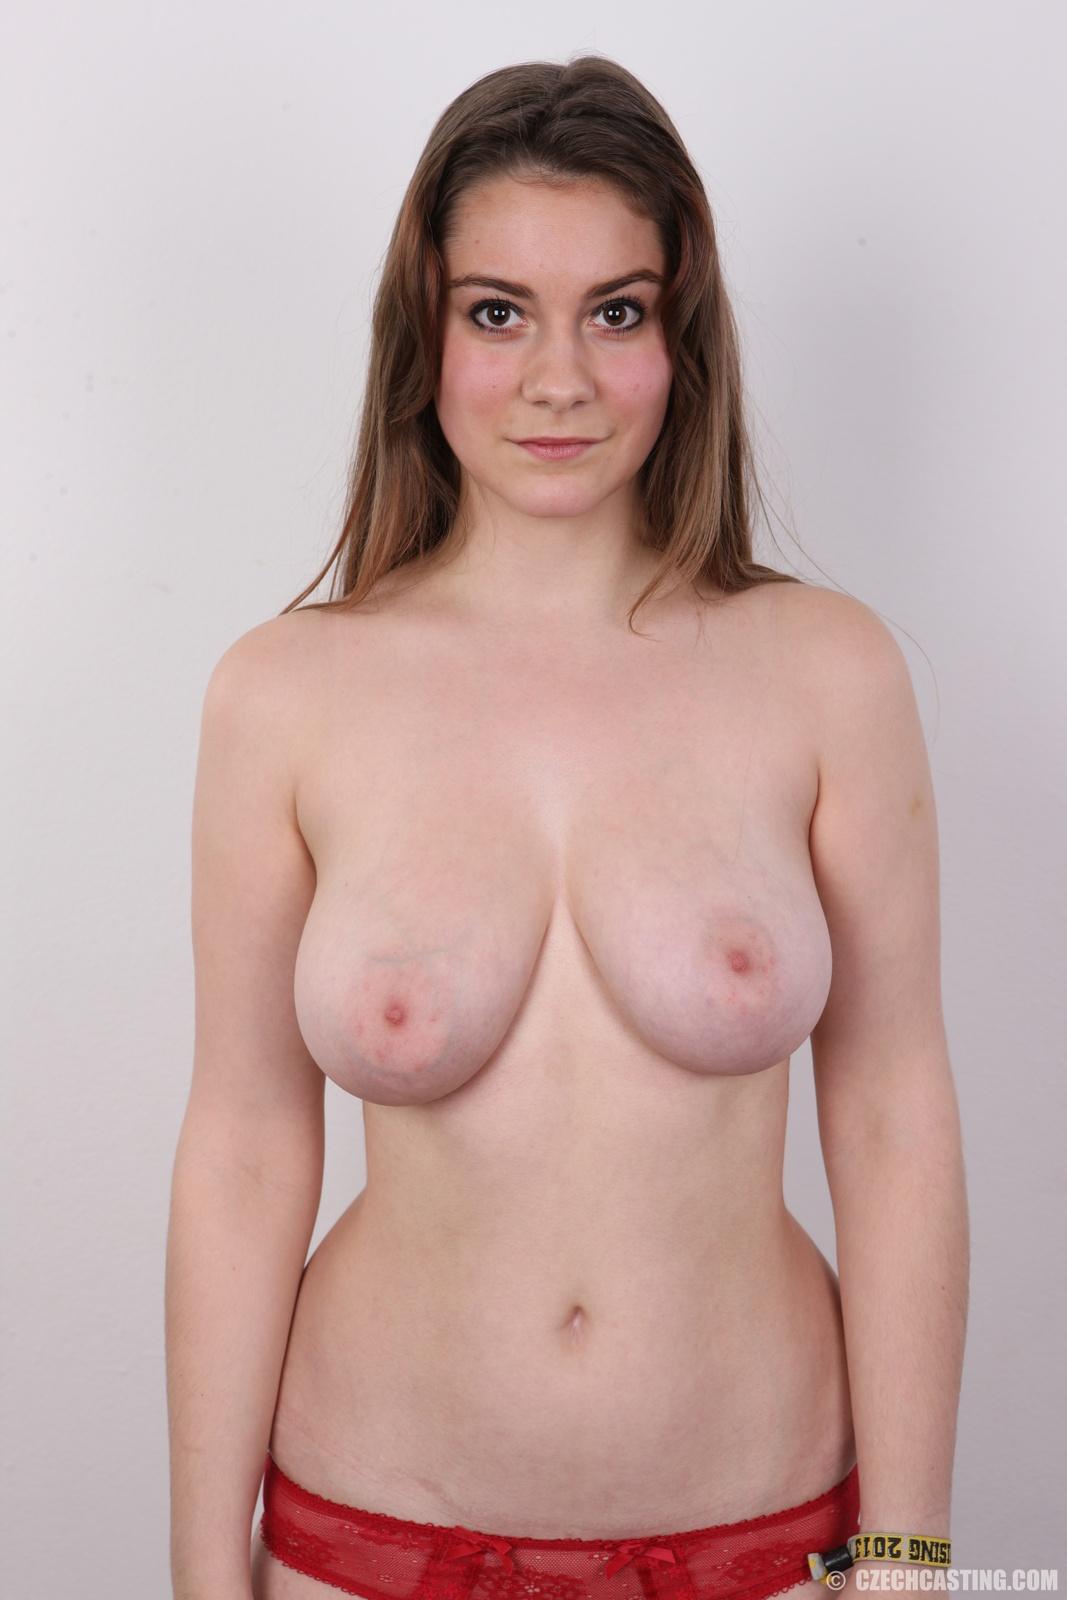 Girl naked on moterbikes